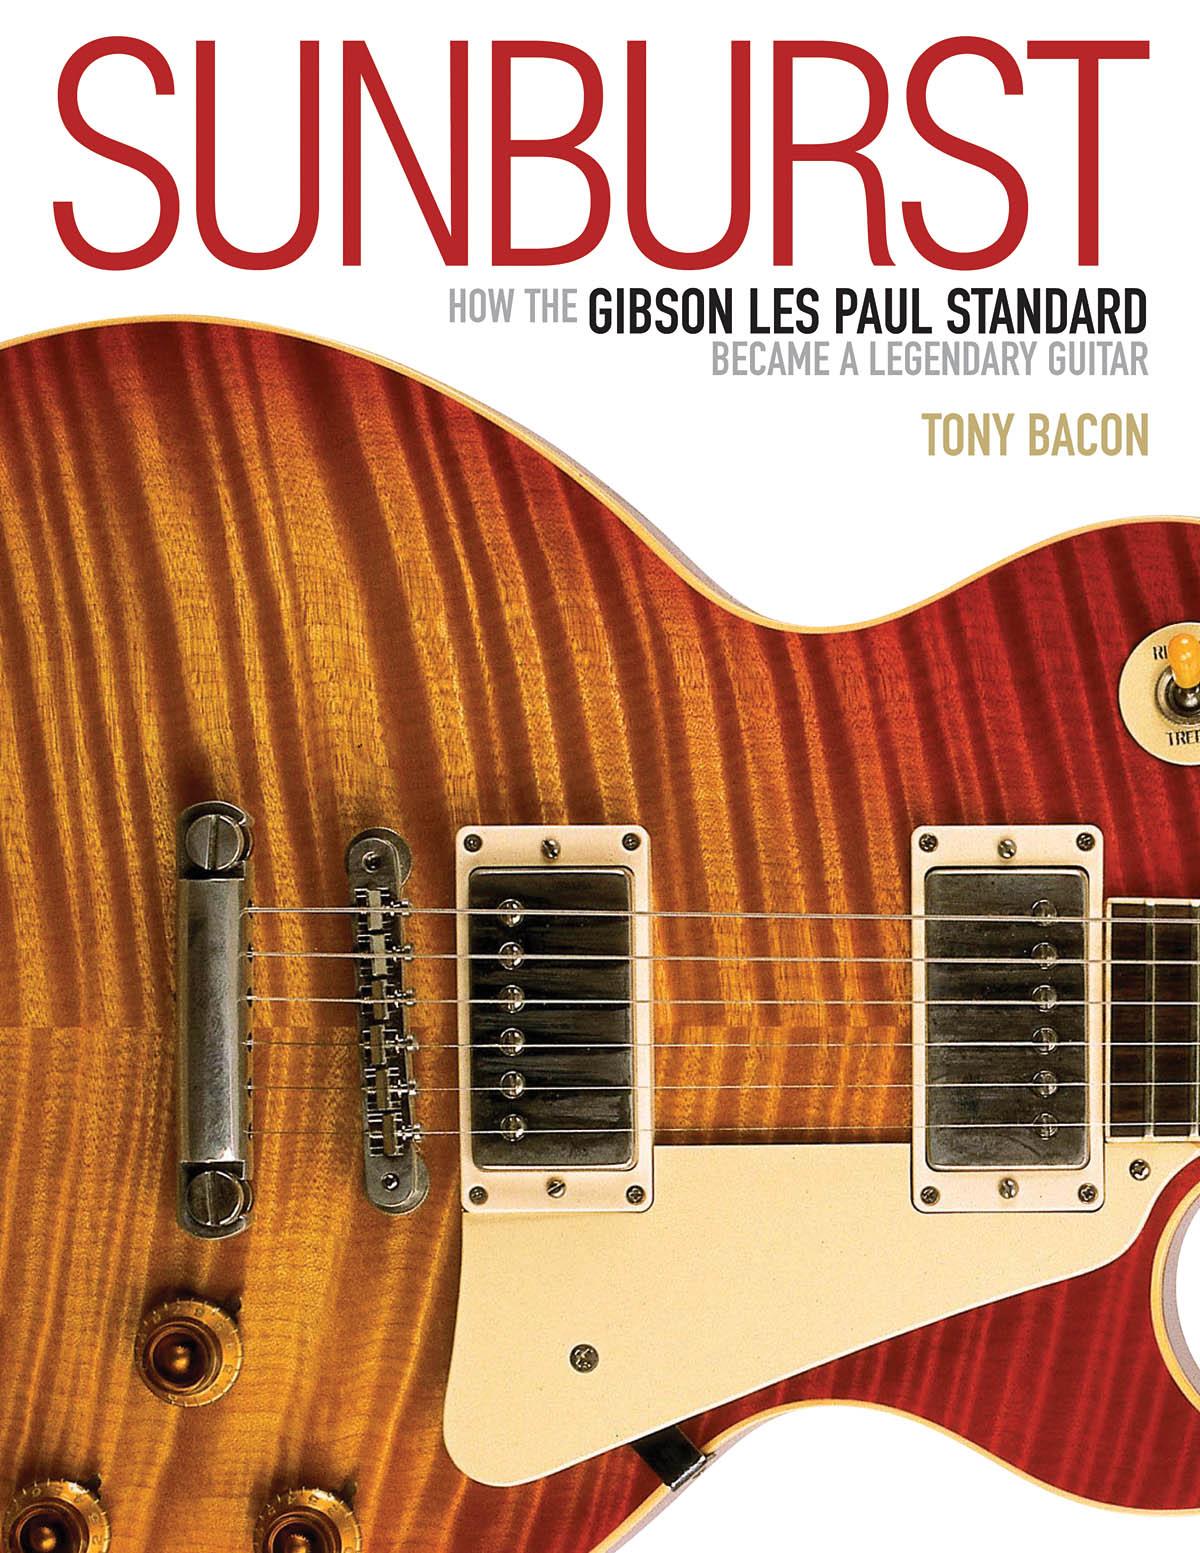 Sunburst: Reference Books